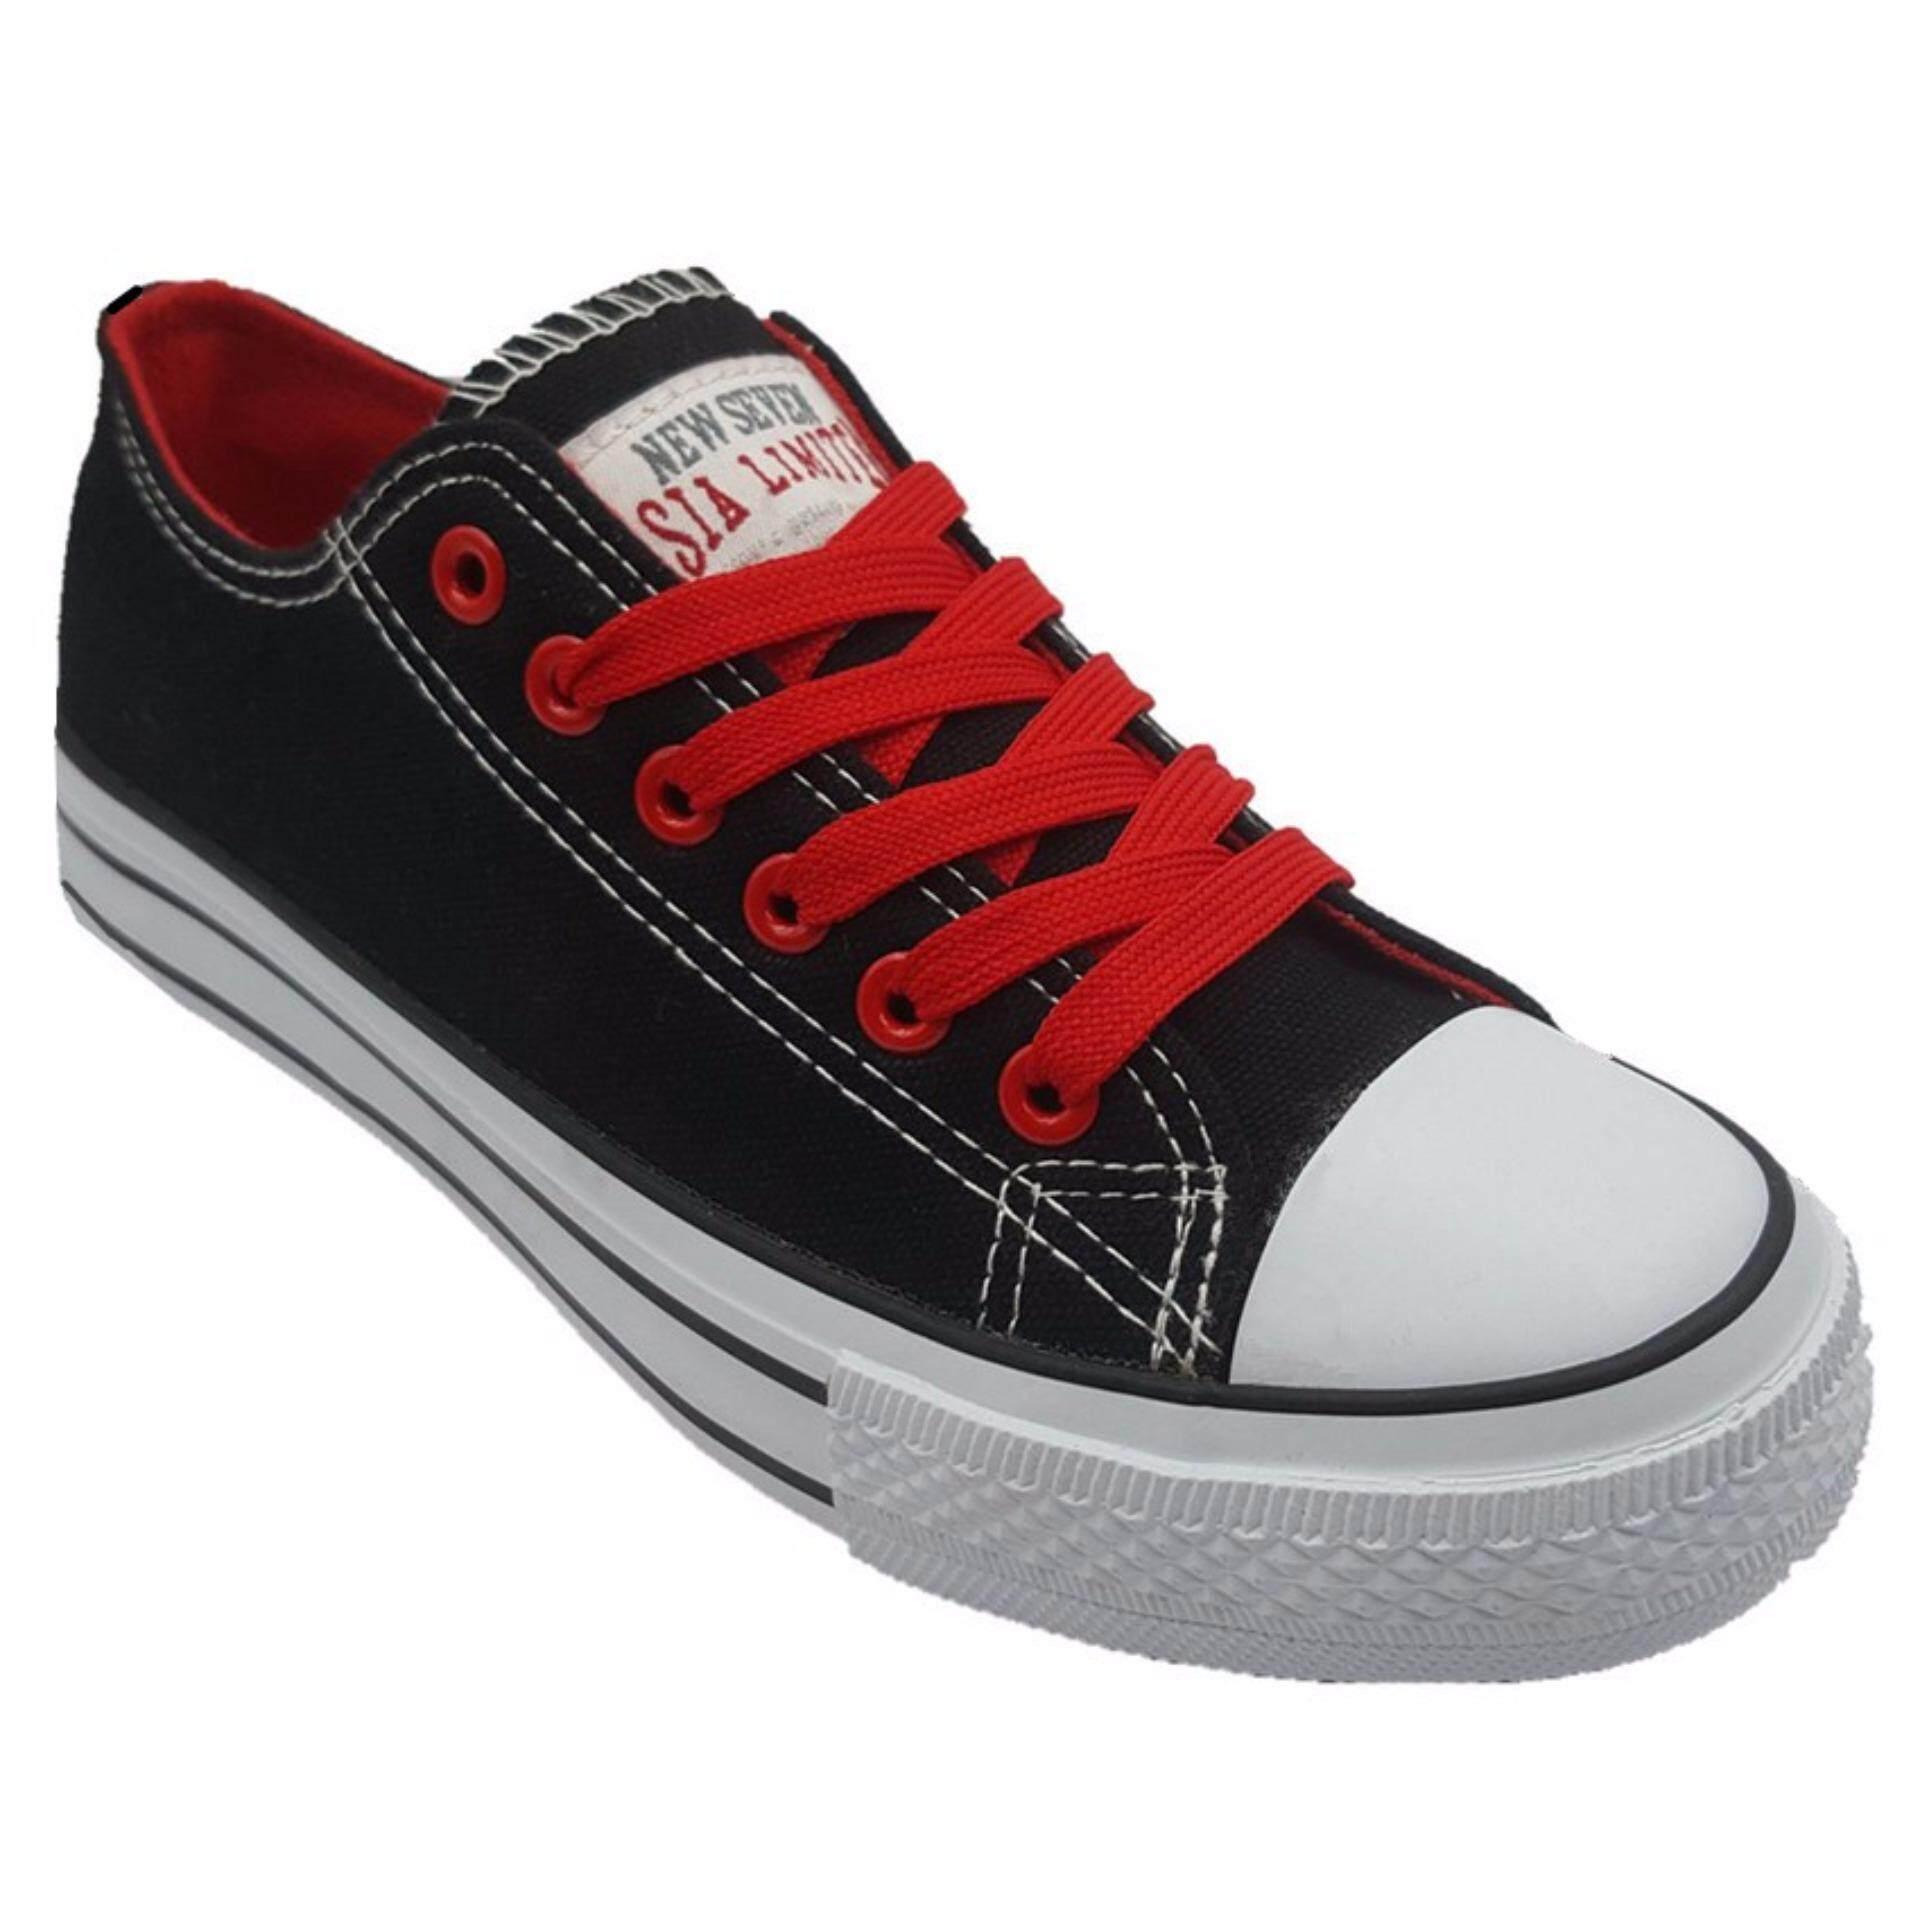 New Seven Lo Cut Canvas Shoes